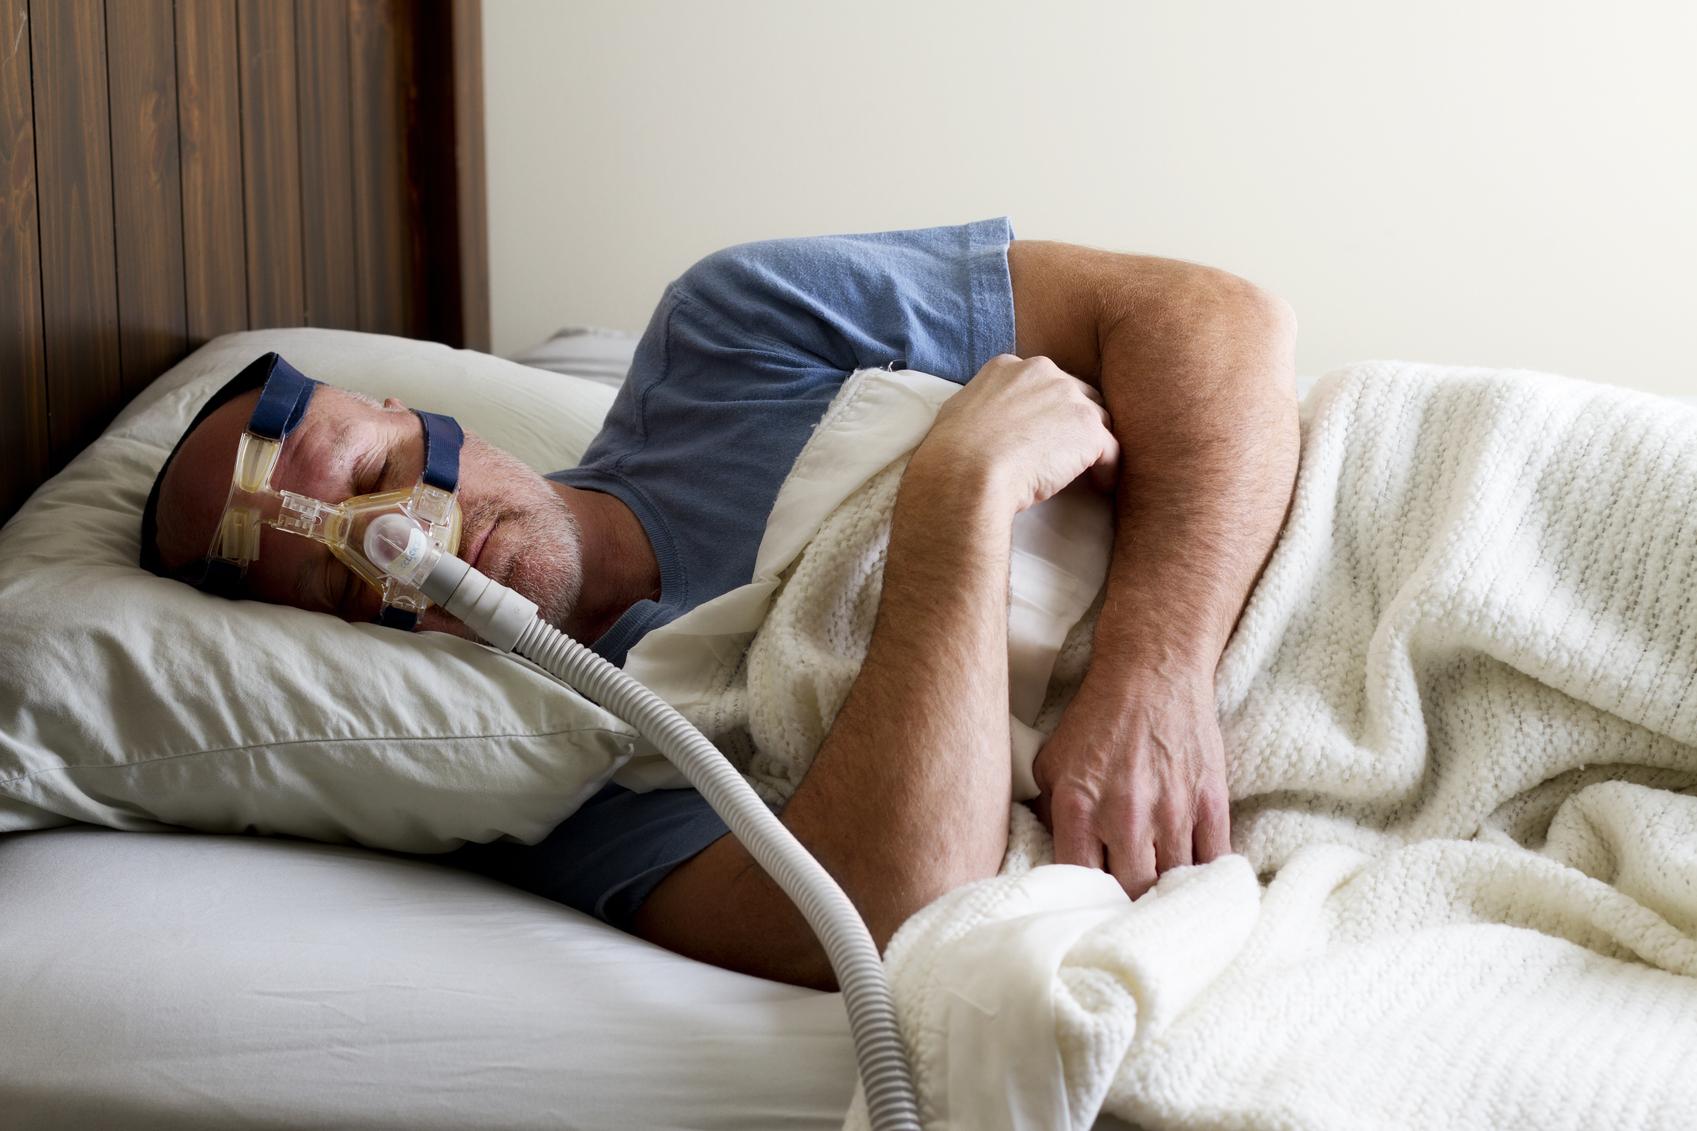 Sleep apnea can play a huge factor in Drowsy Driving